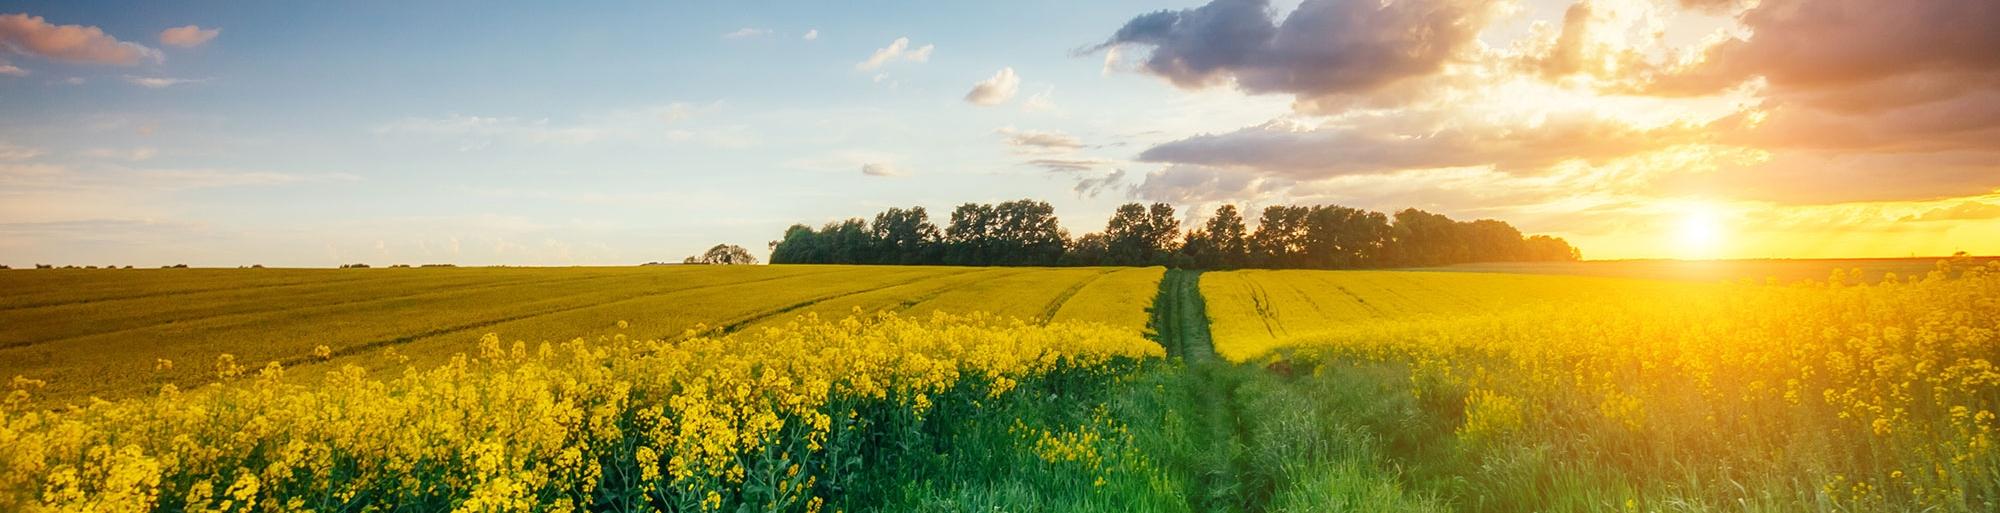 bigstock-Fantastic-views-of-the-green-g-128236568.jpg